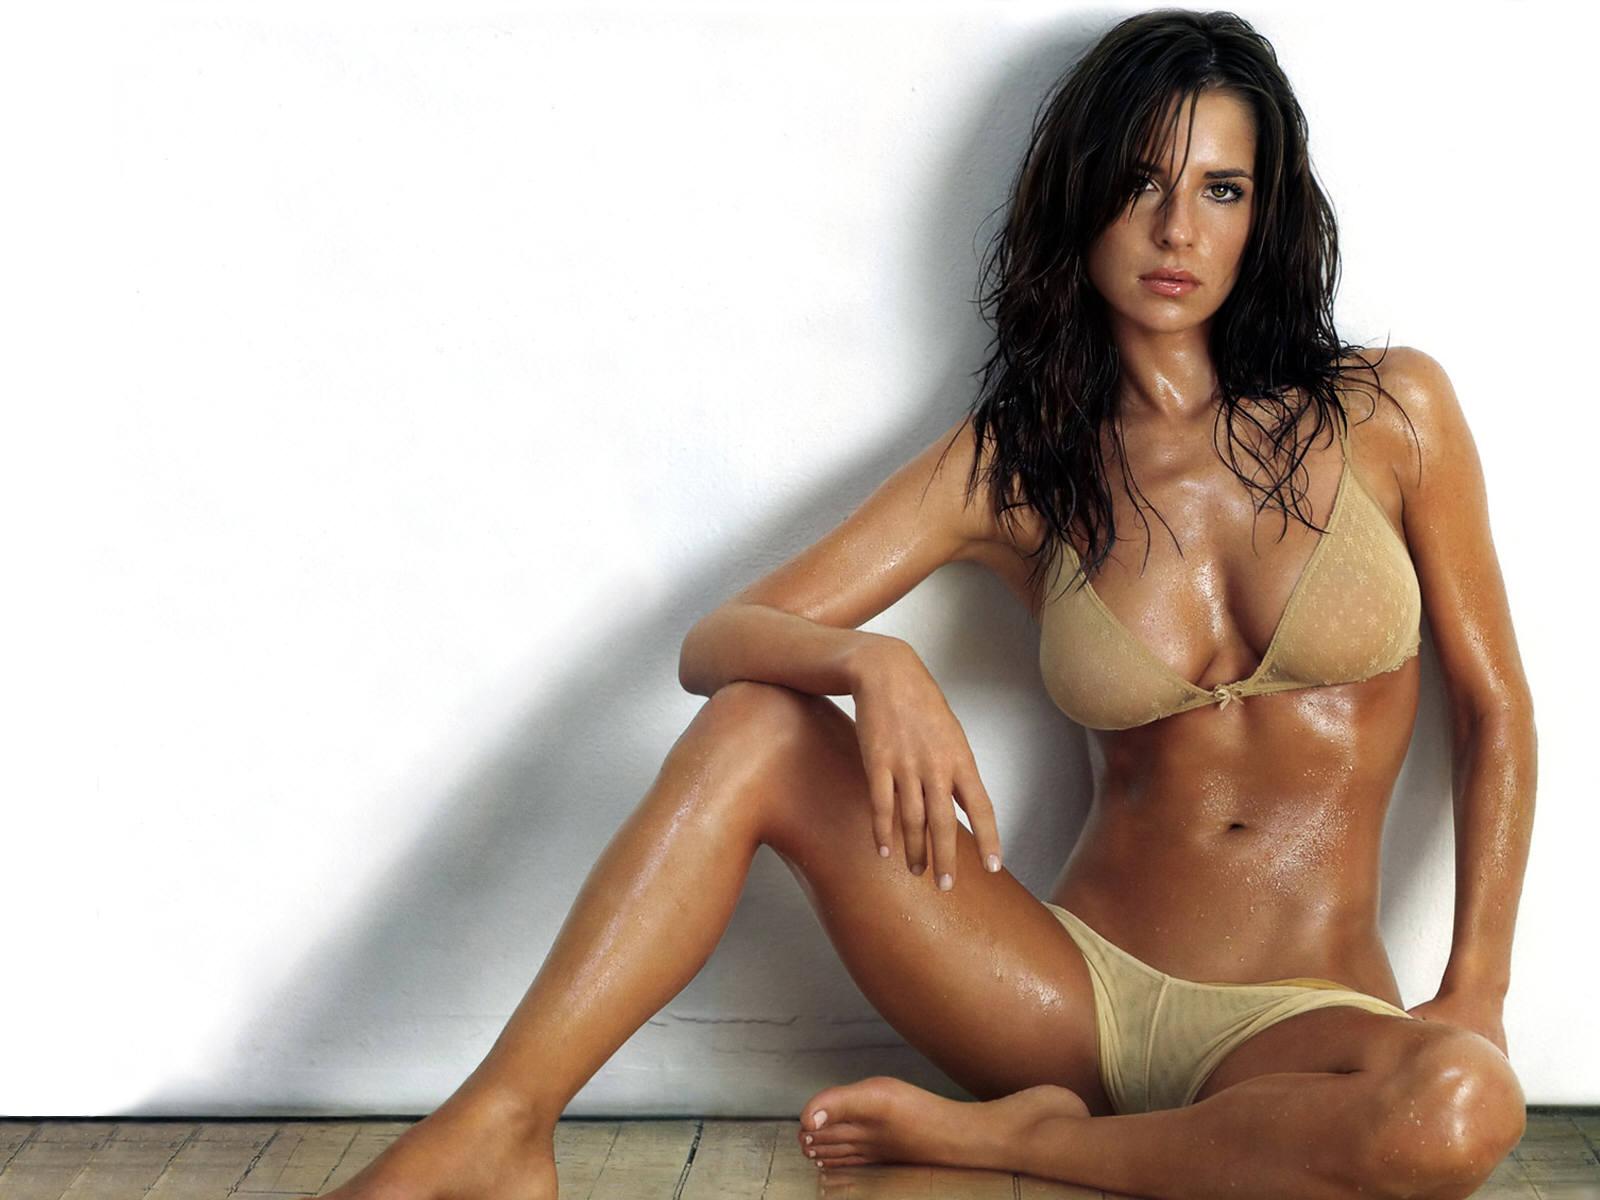 mild blogs: girls hot babes wallpapers